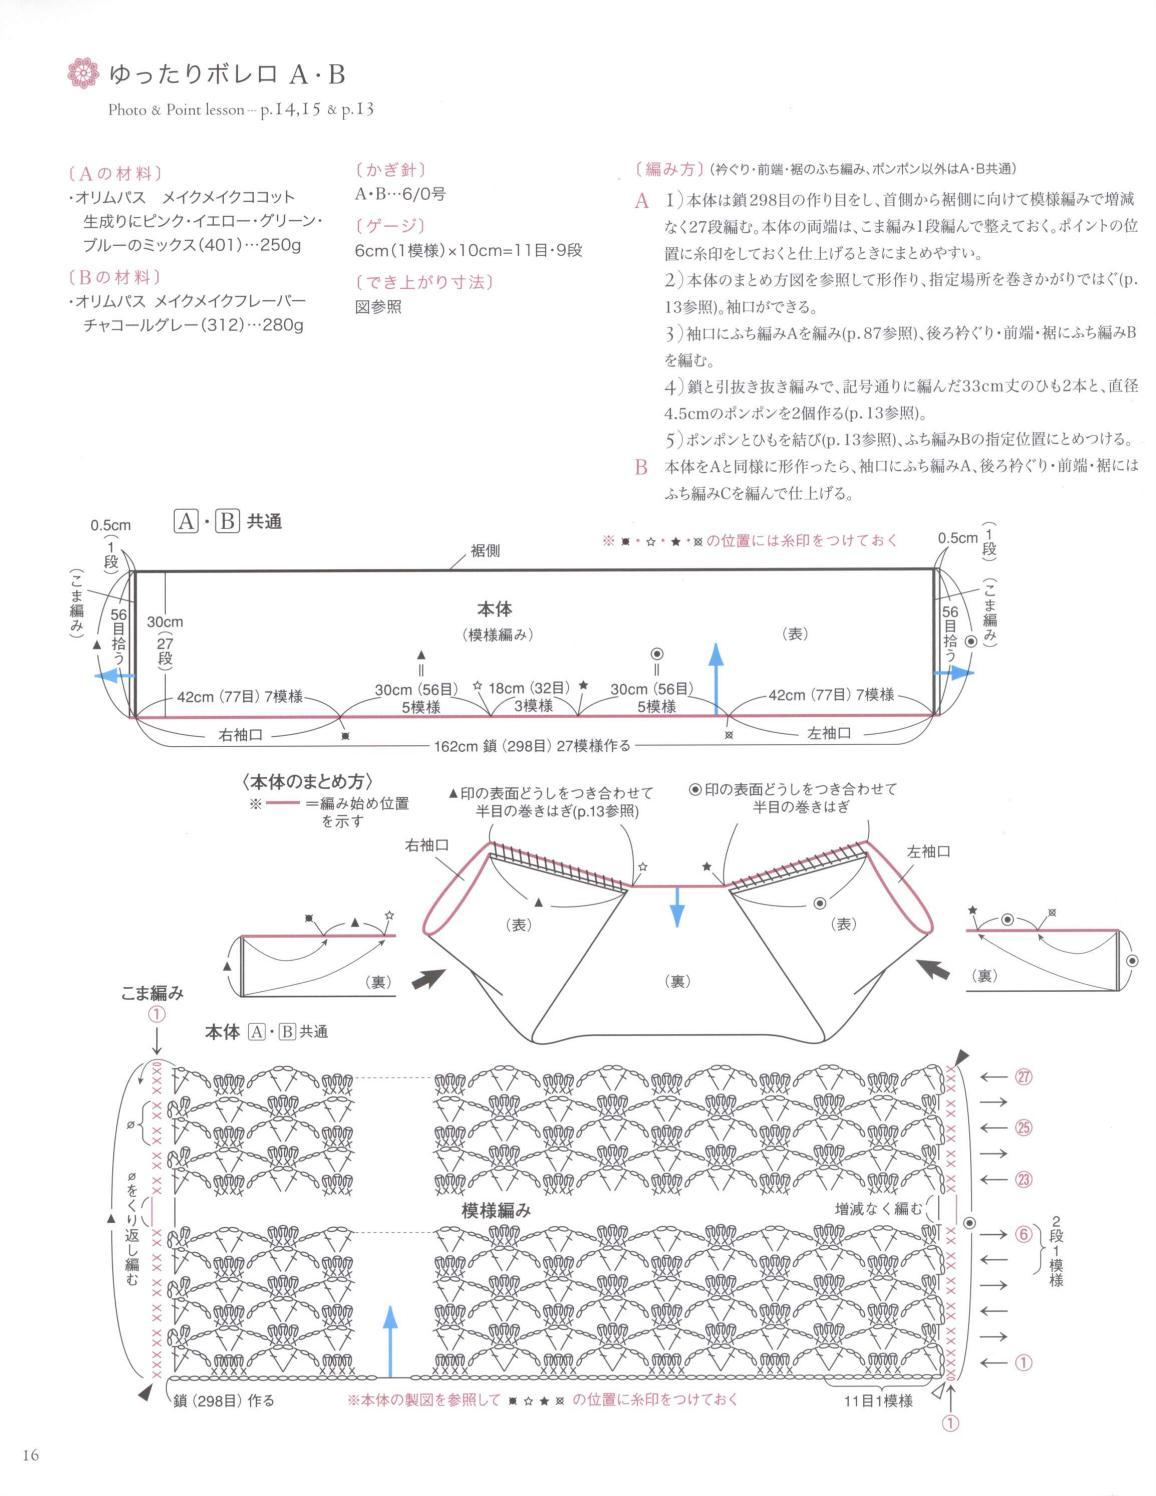 Asahi original crochet best selection 2012 page 16